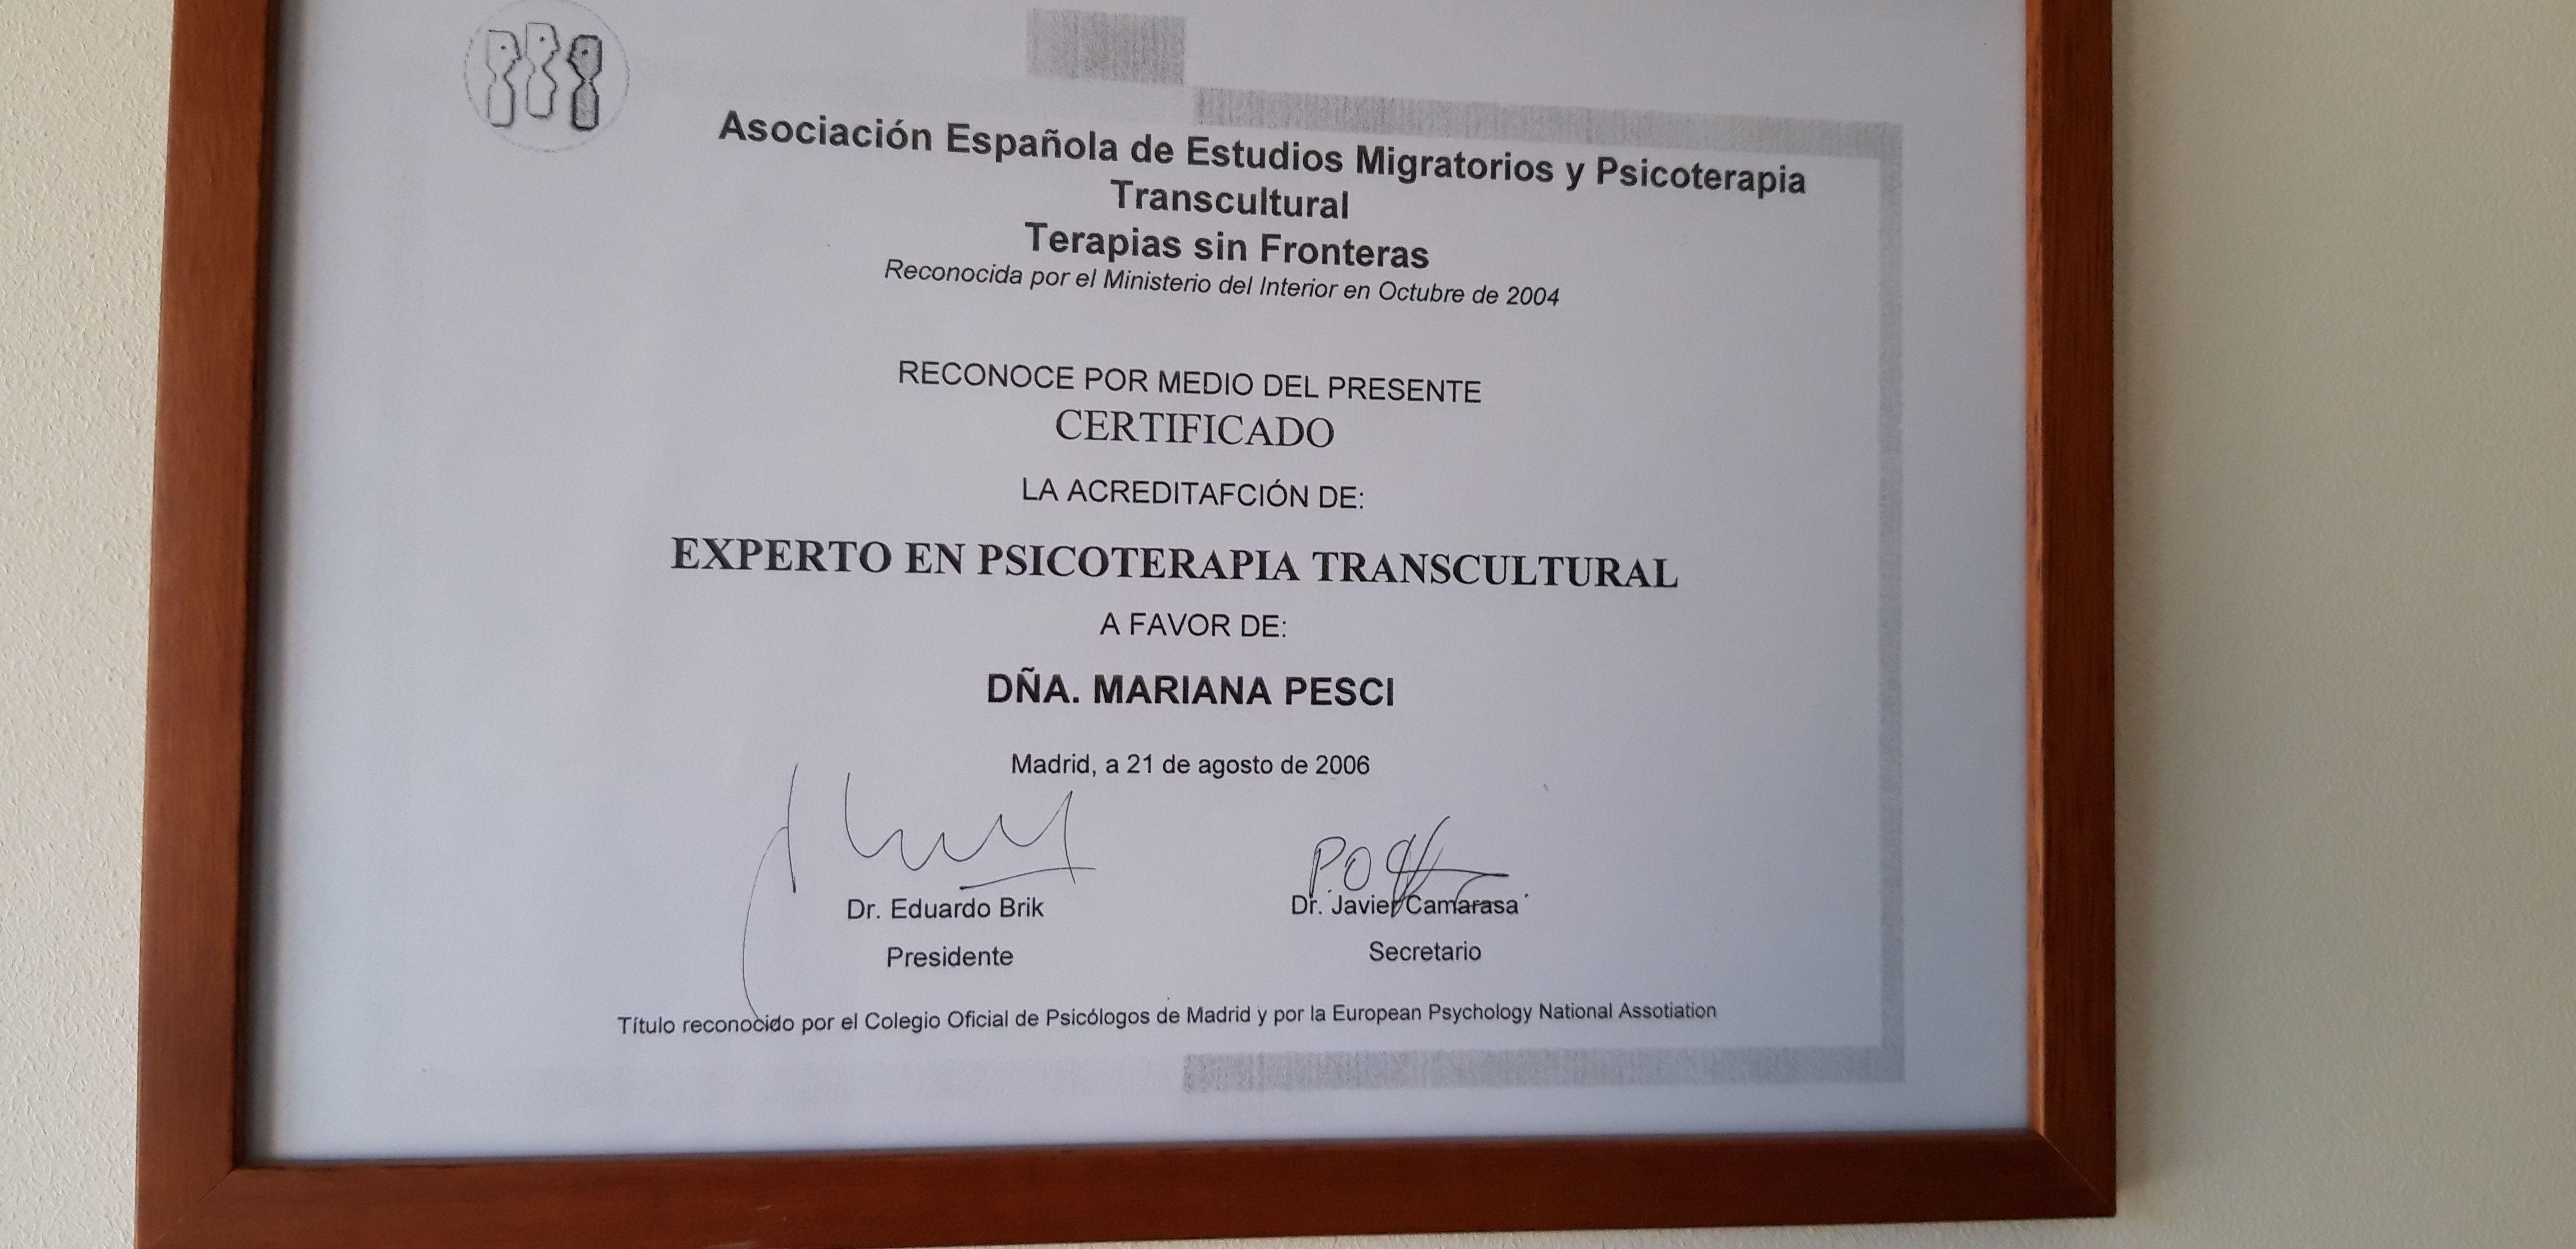 Experto en Psicoterapia Transcultural